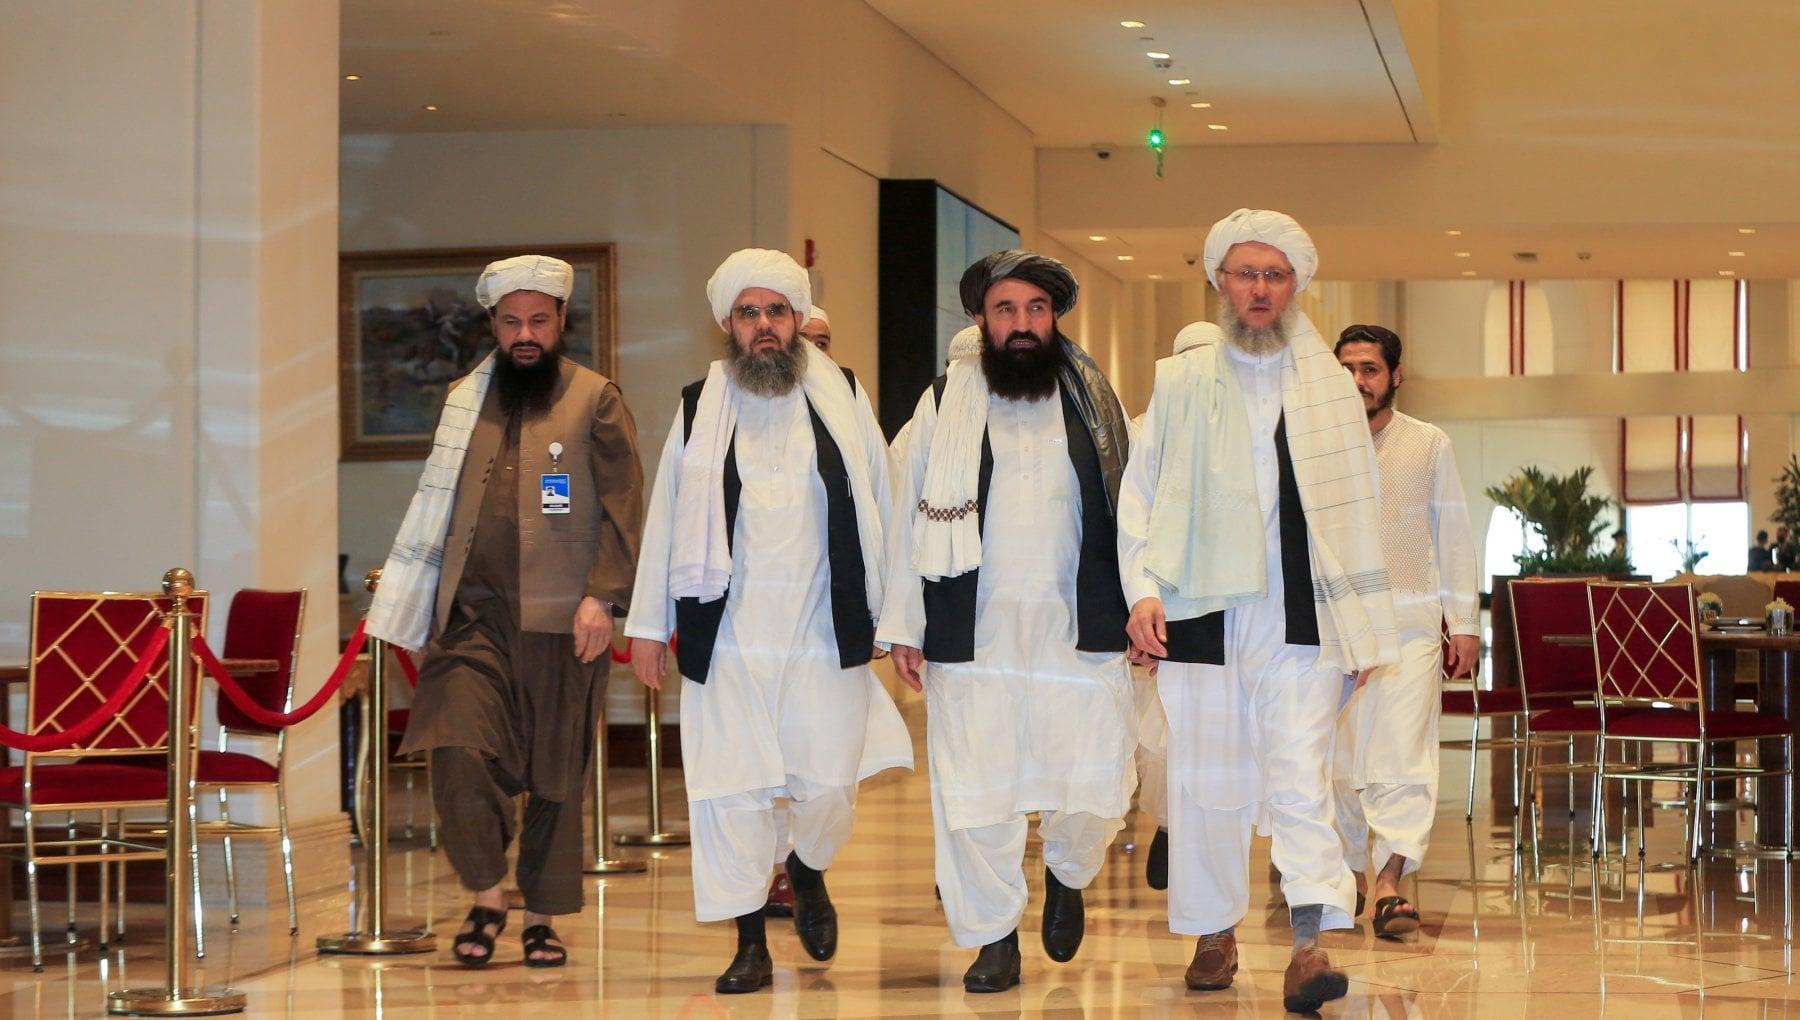 225520011 7f1df715 6ef8 4c58 800e 441a696b335d - Afghanistan tra Jihad e clero, i nuovi talebani sul modello Iran